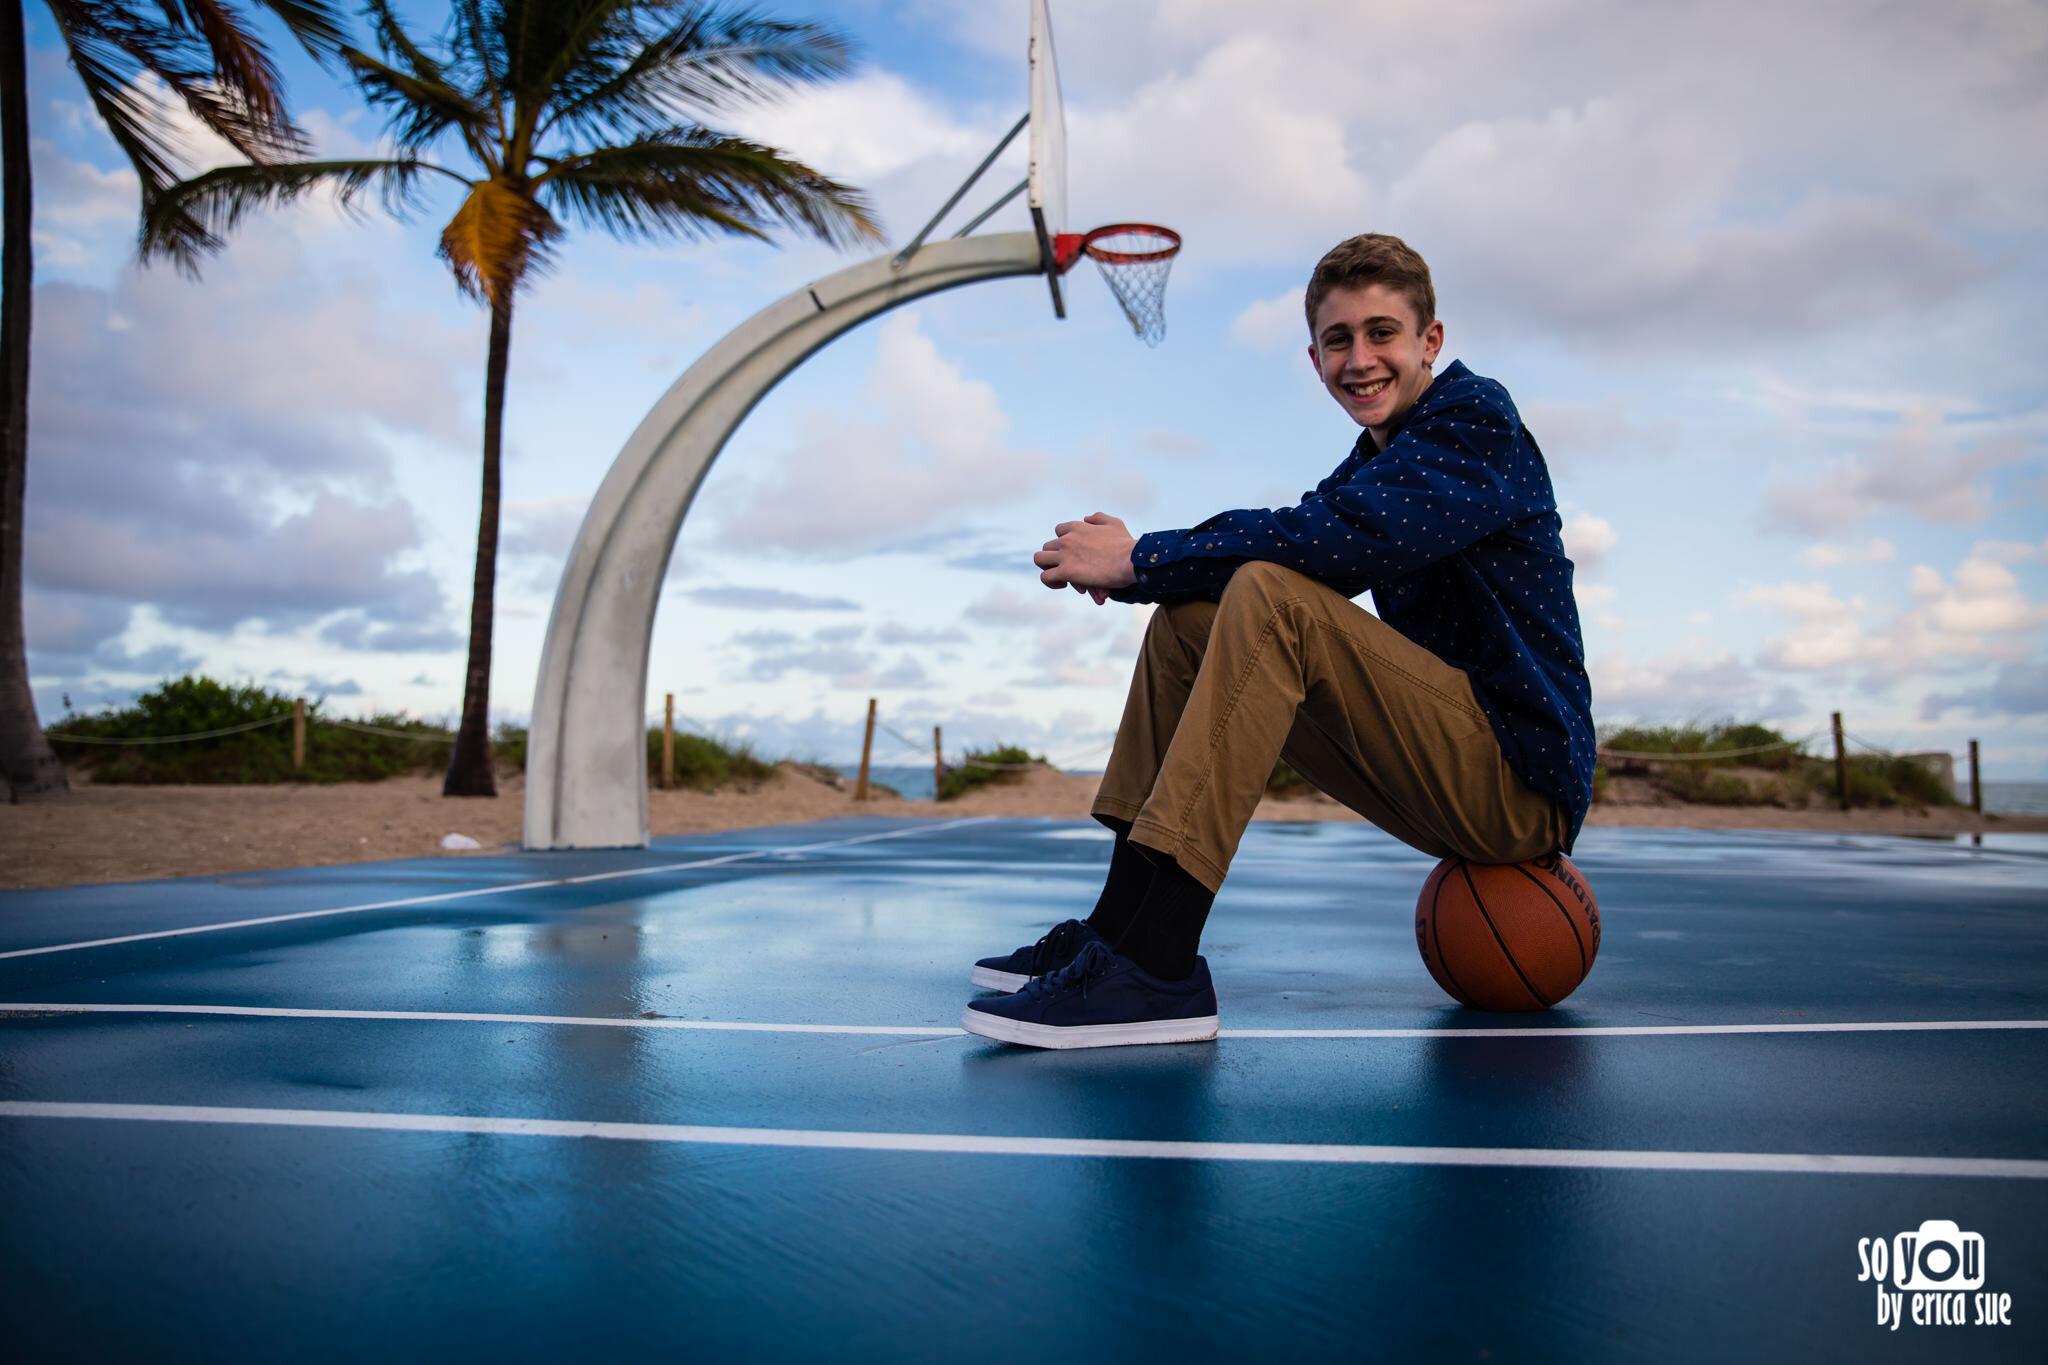 so-you-by-erica-sue-ft-lauderdale-beach-basketball-mitzvah-pre-shoot-9485.JPG